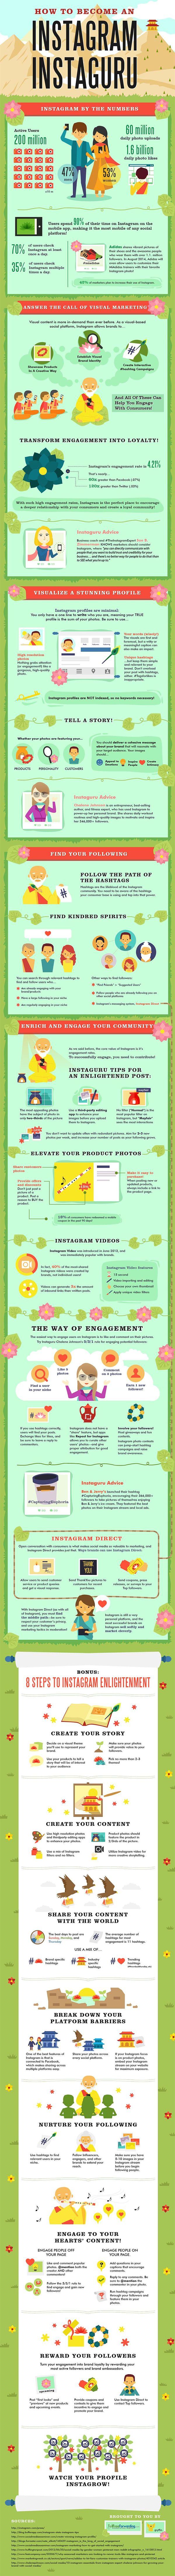 #InstagramTips 8 Superb Tips to Become an Instagram Marketing Guru #CrazySocialMediaTips #SocialMediaTips